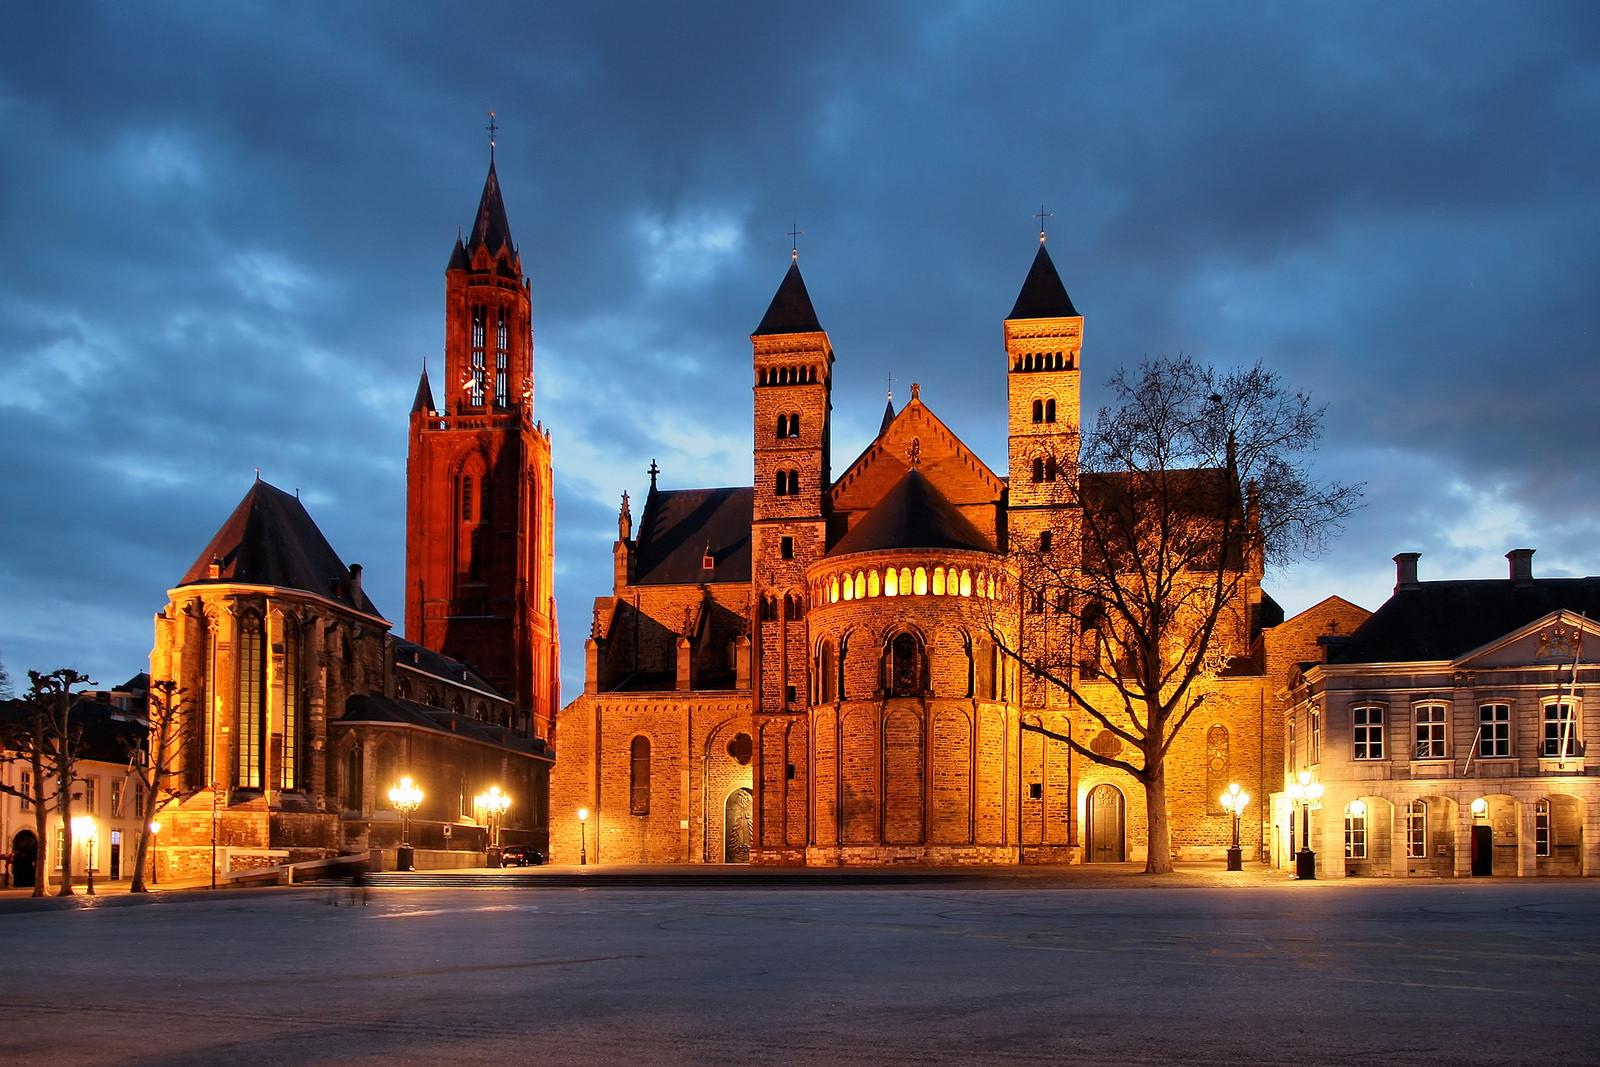 Workshops Maastricht Sint-Servaasbasiliek Kerk Basilica of Saint Servatius